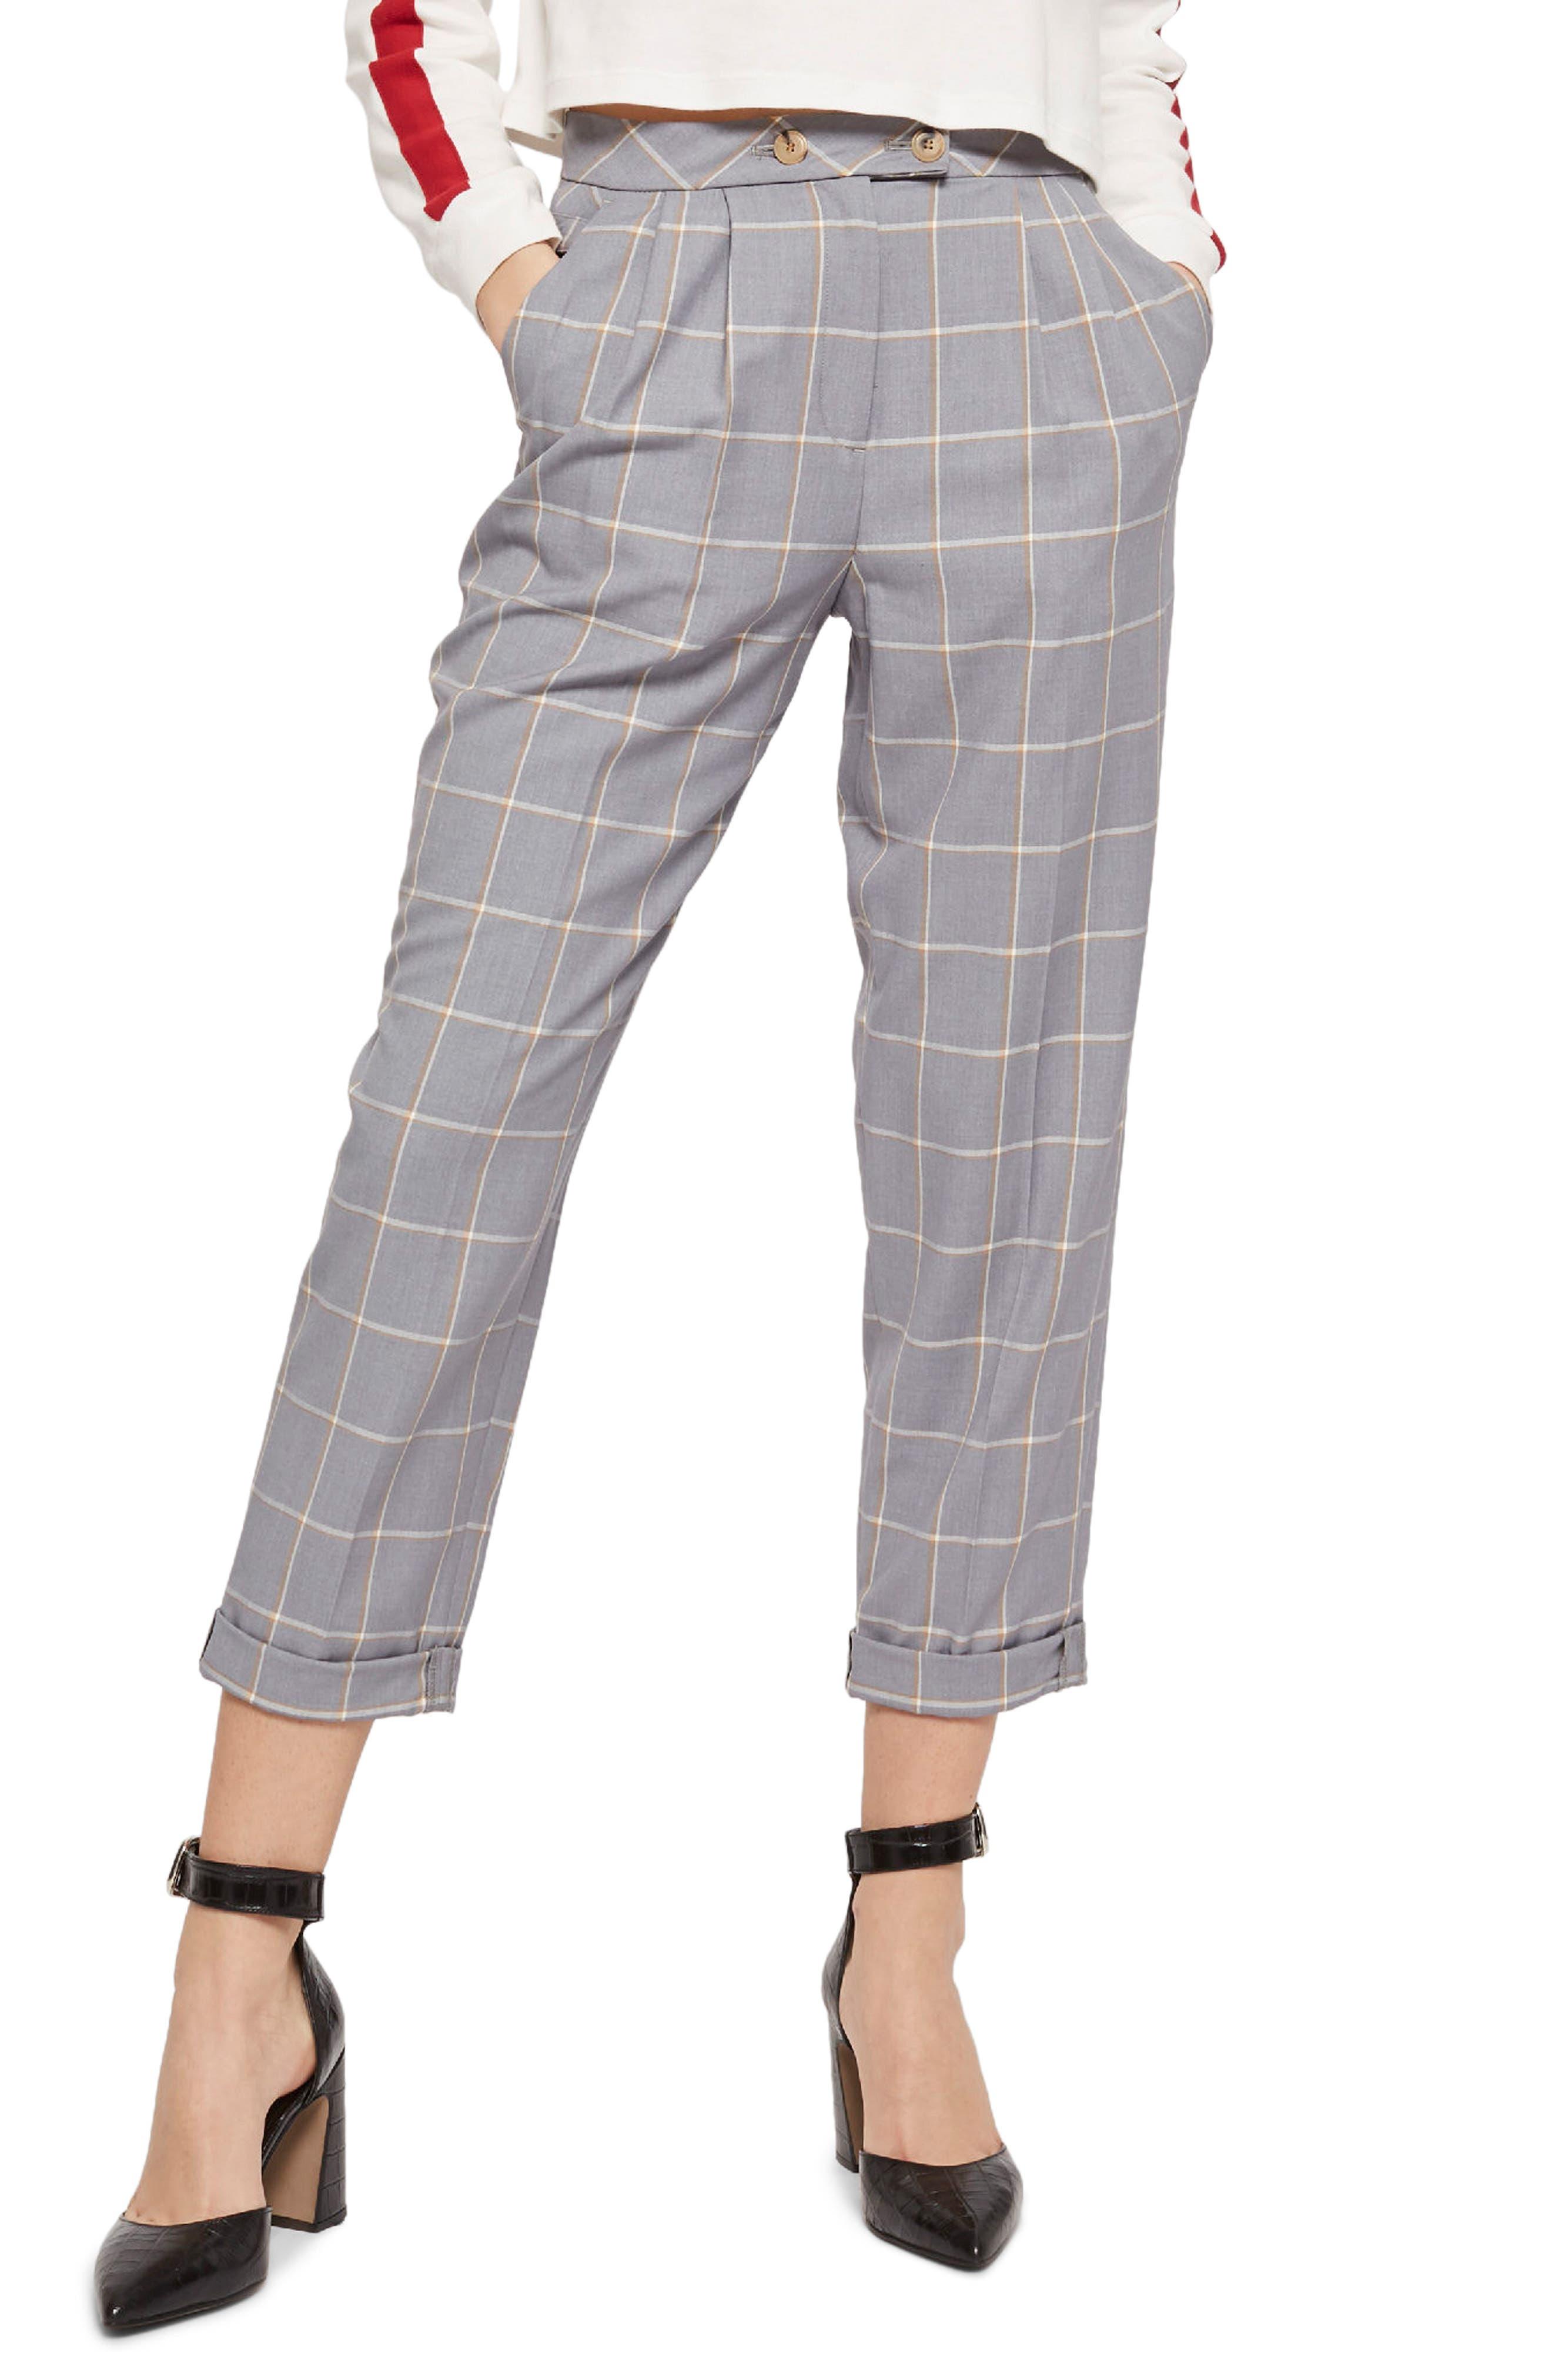 Topshop Windowpane Plaid Trousers